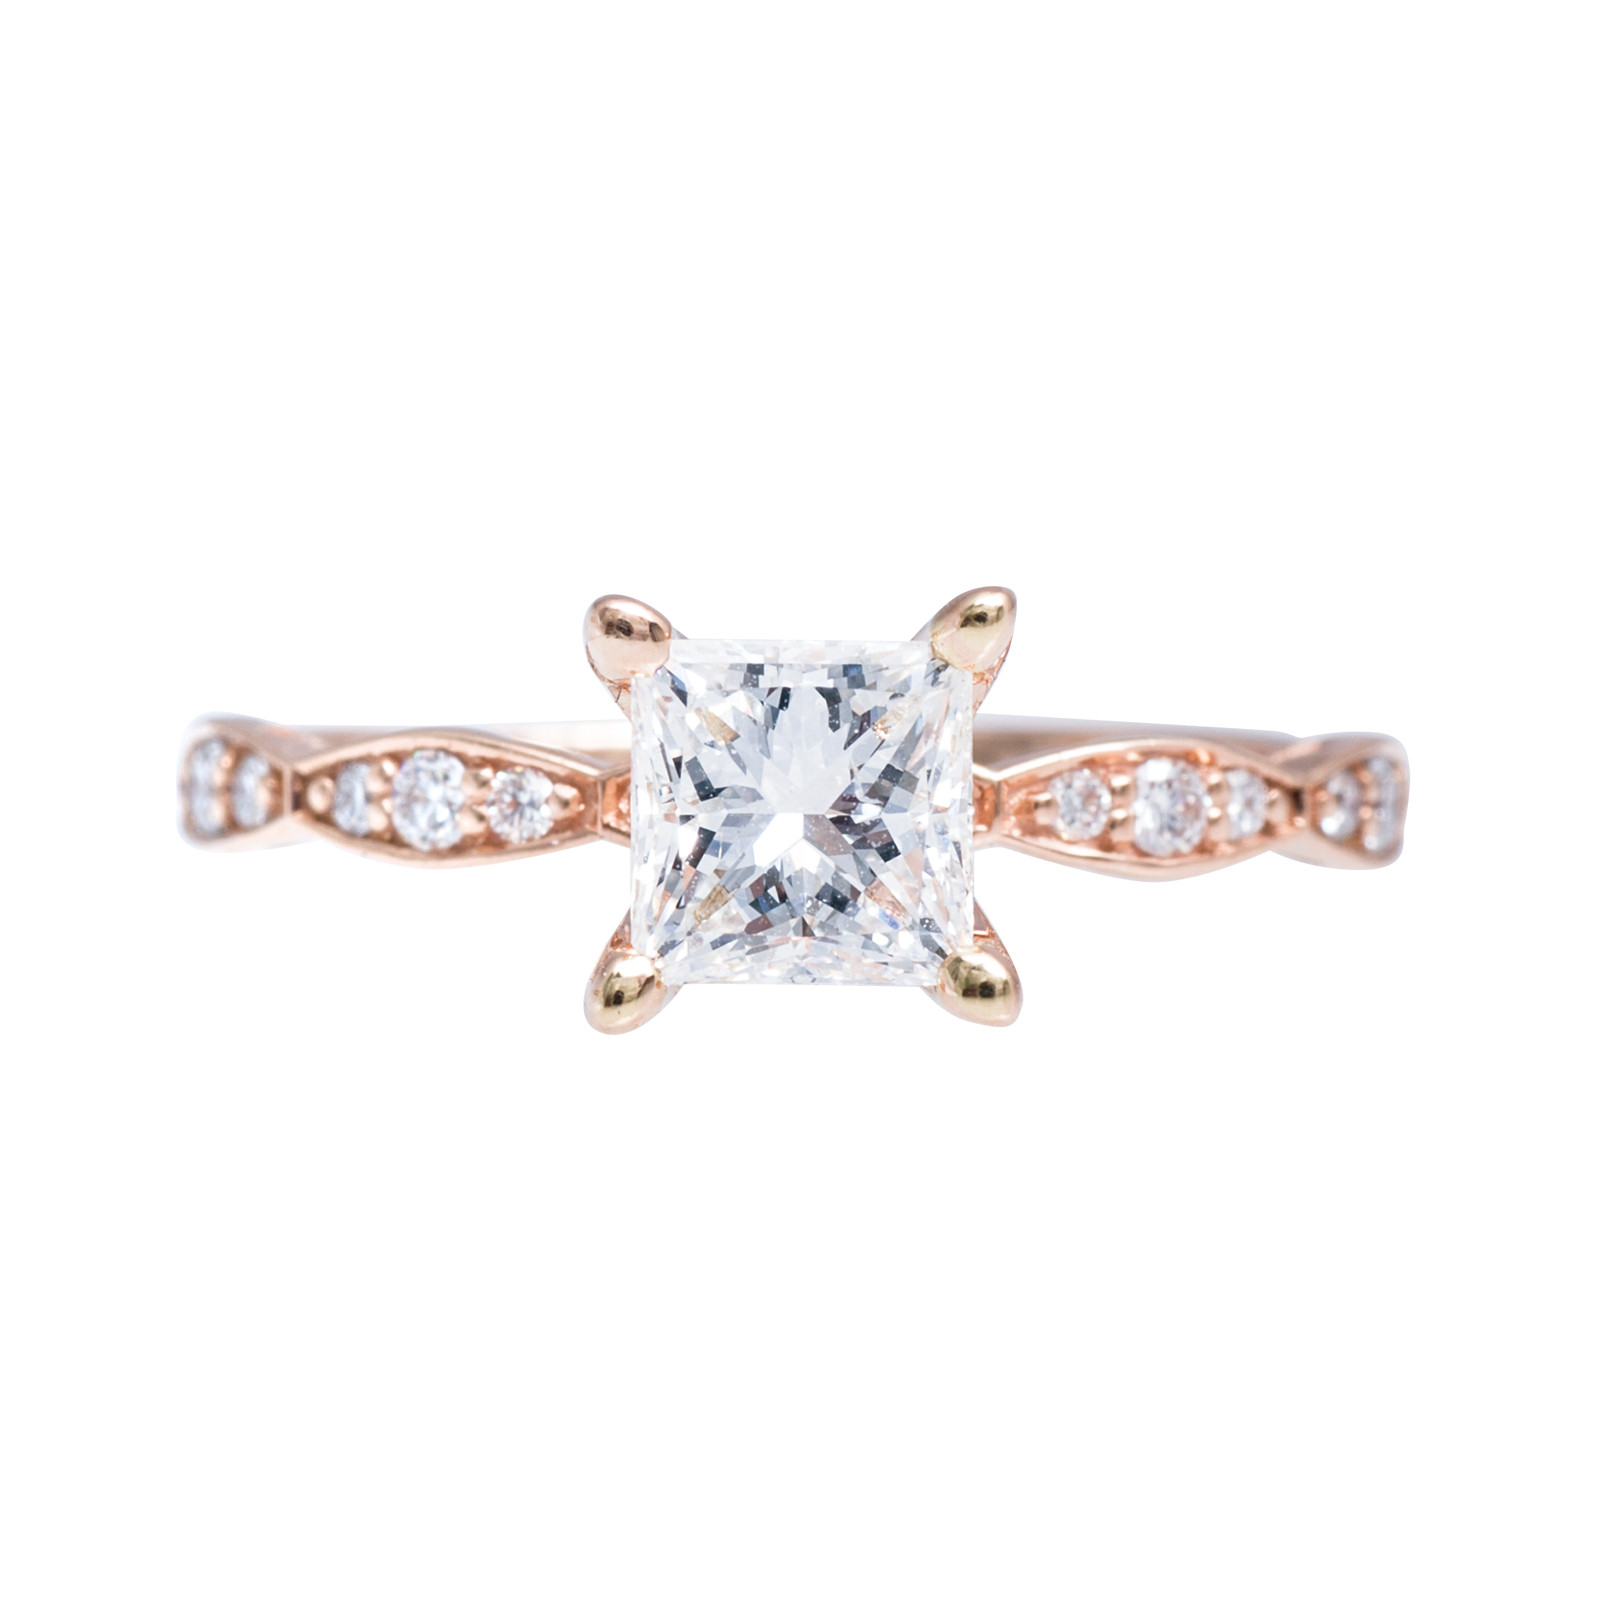 Vintage Tacori 1.05 CTW Diamond Engagement Ring